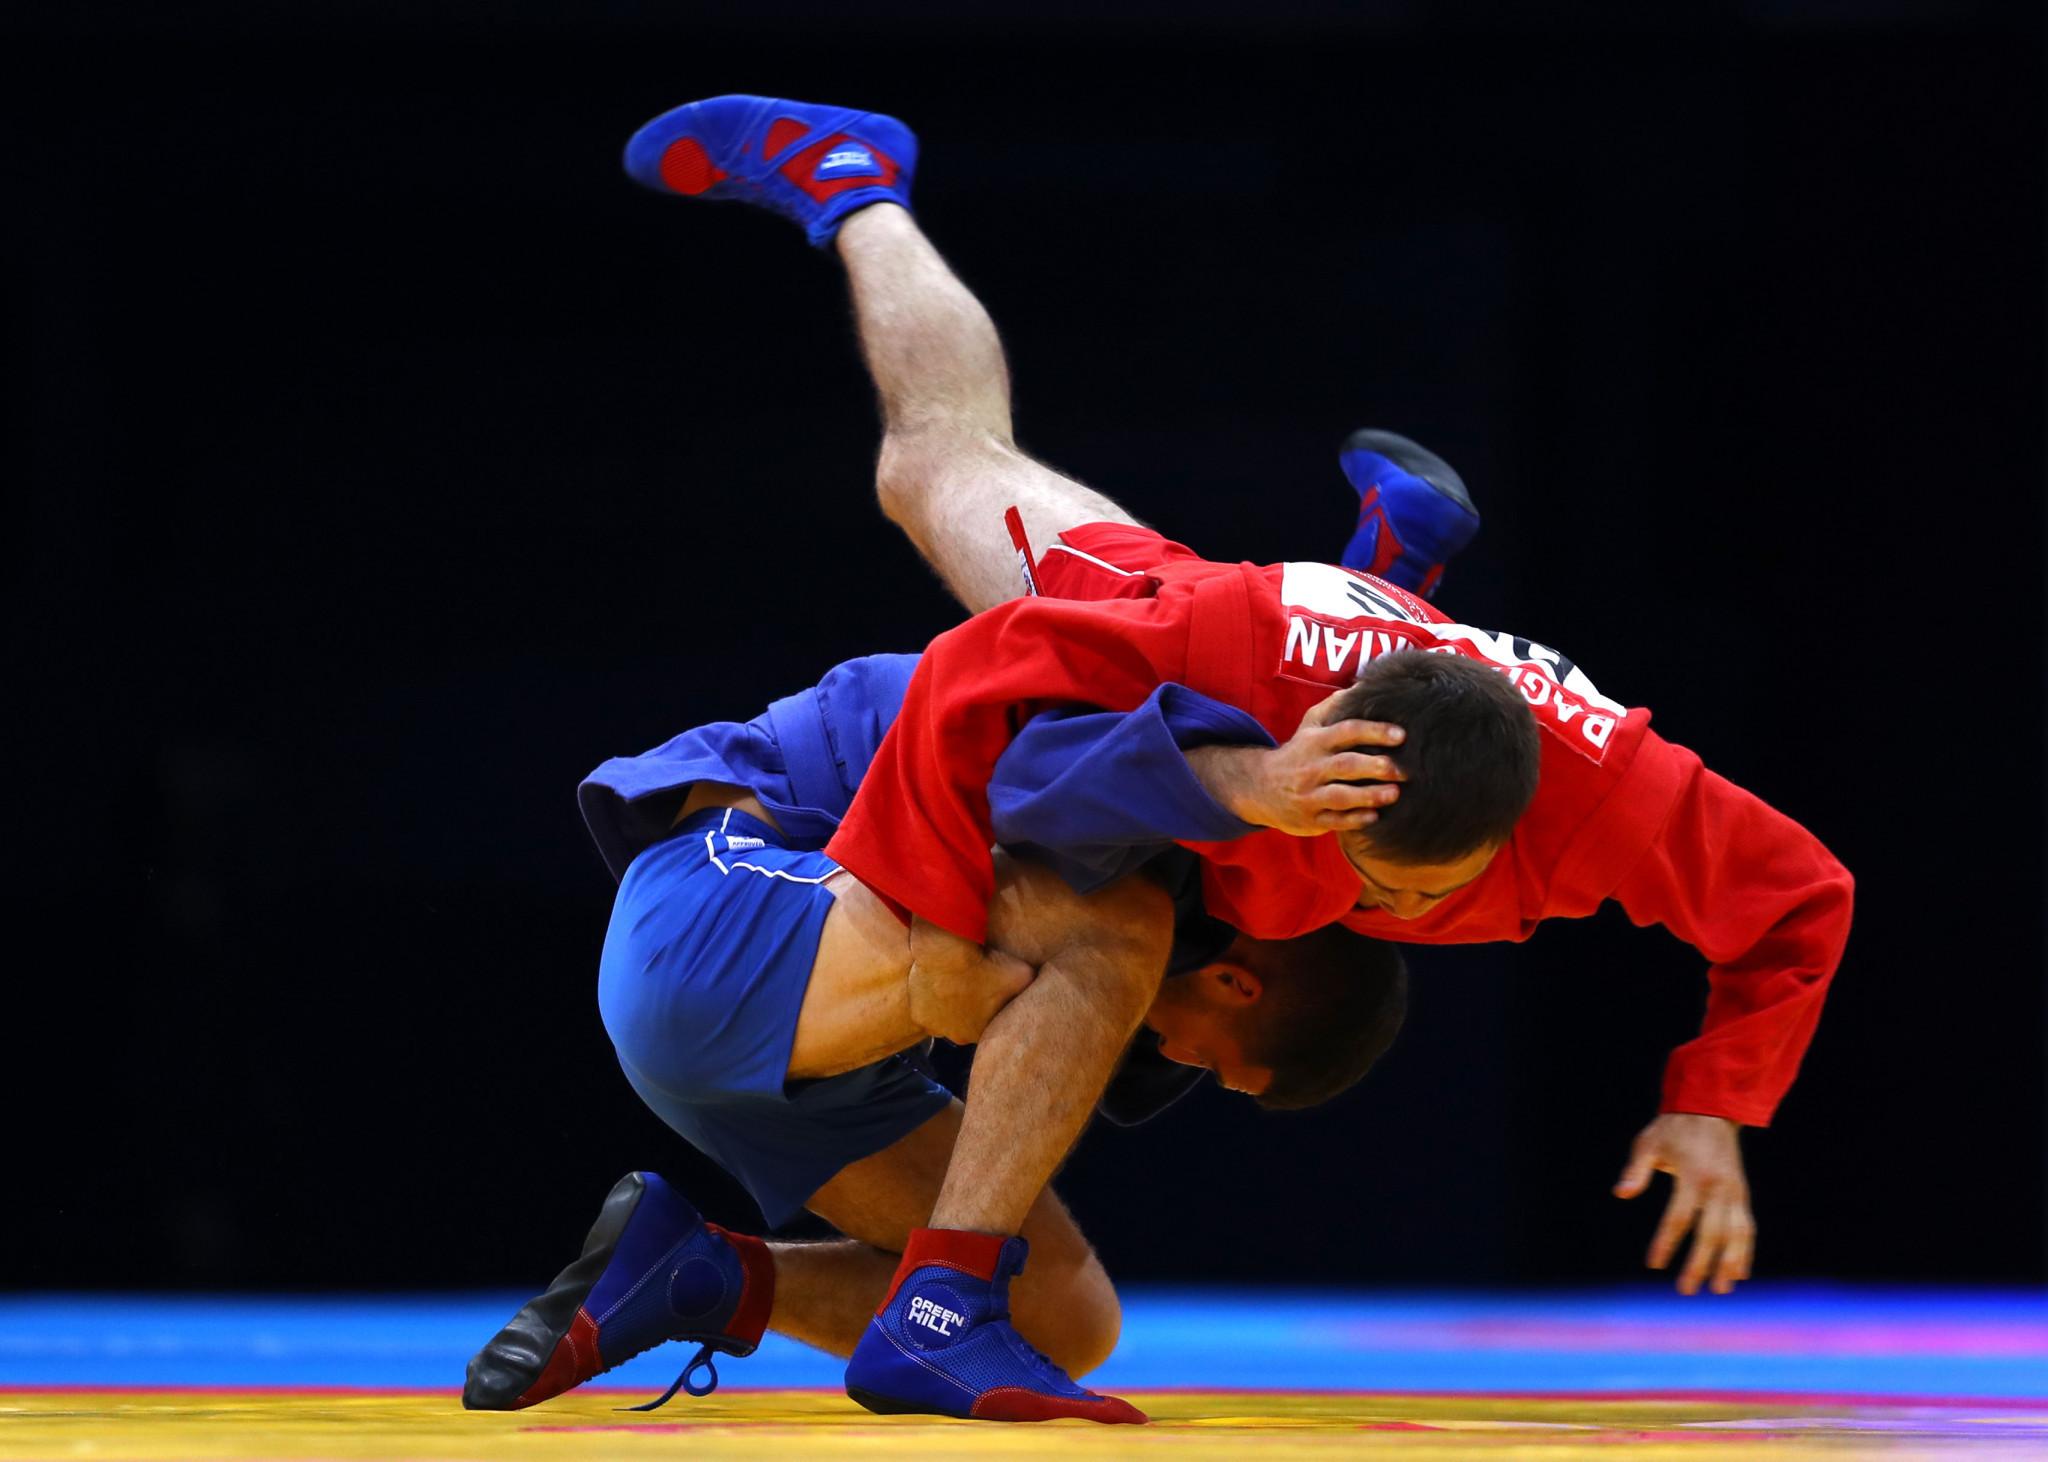 Russia's Ruslan Bagdasarian edged past Greece's Savvas Karakizidis to win the men's sambo under-62kg final ©Getty Images